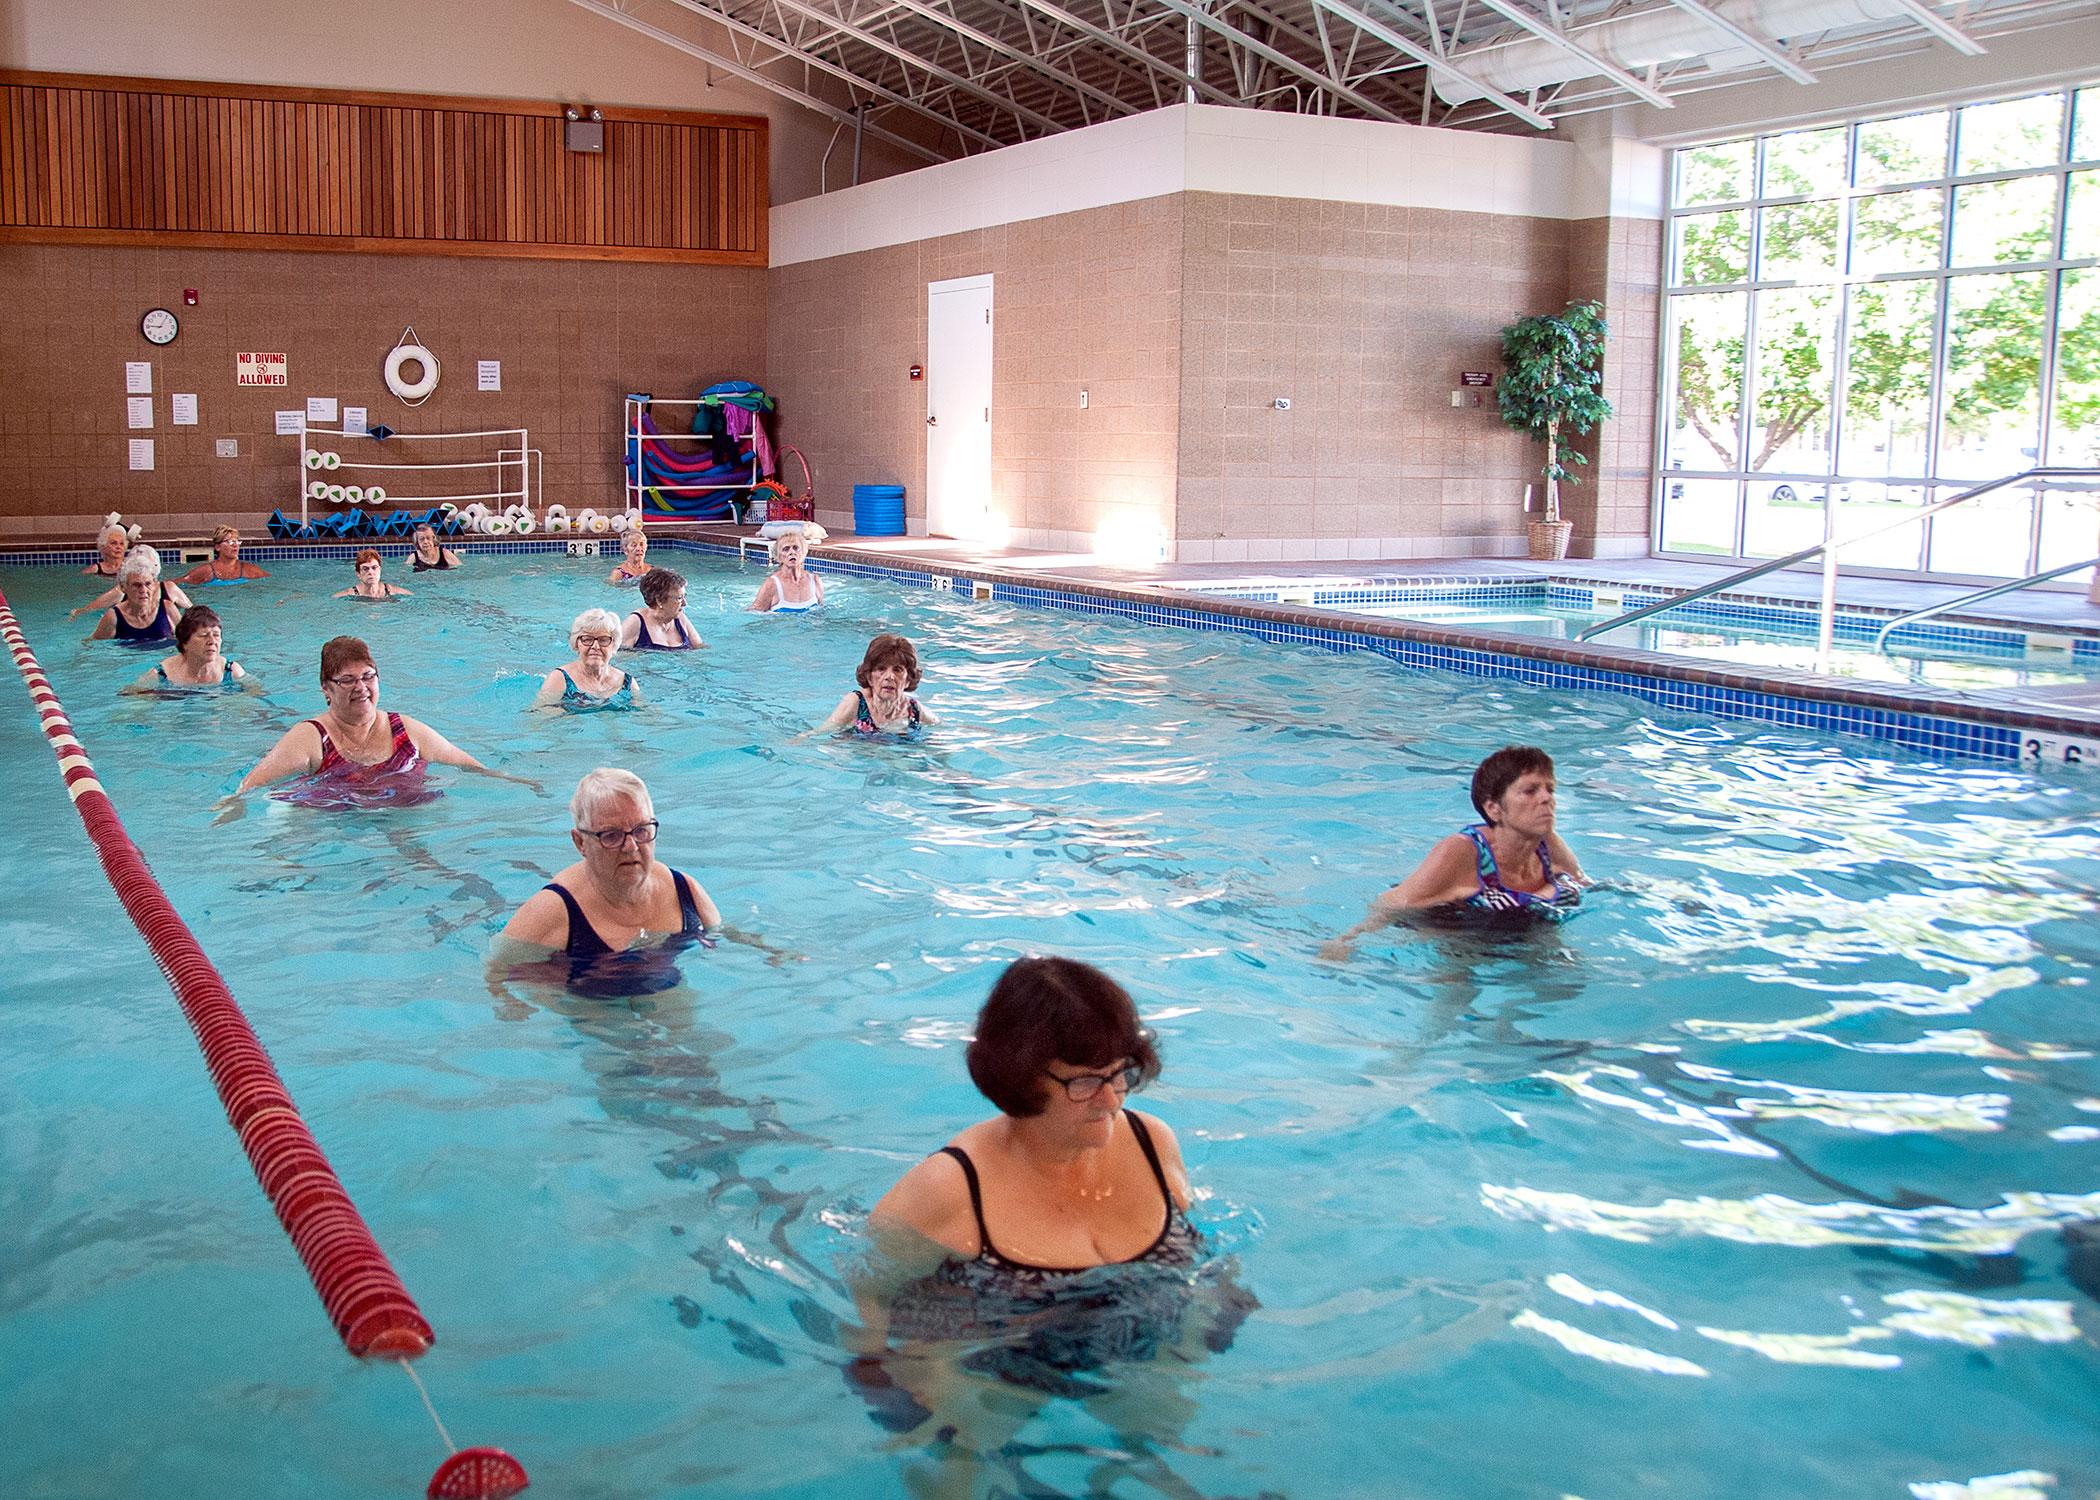 Group of female residents in the pool enjoying an aqua class